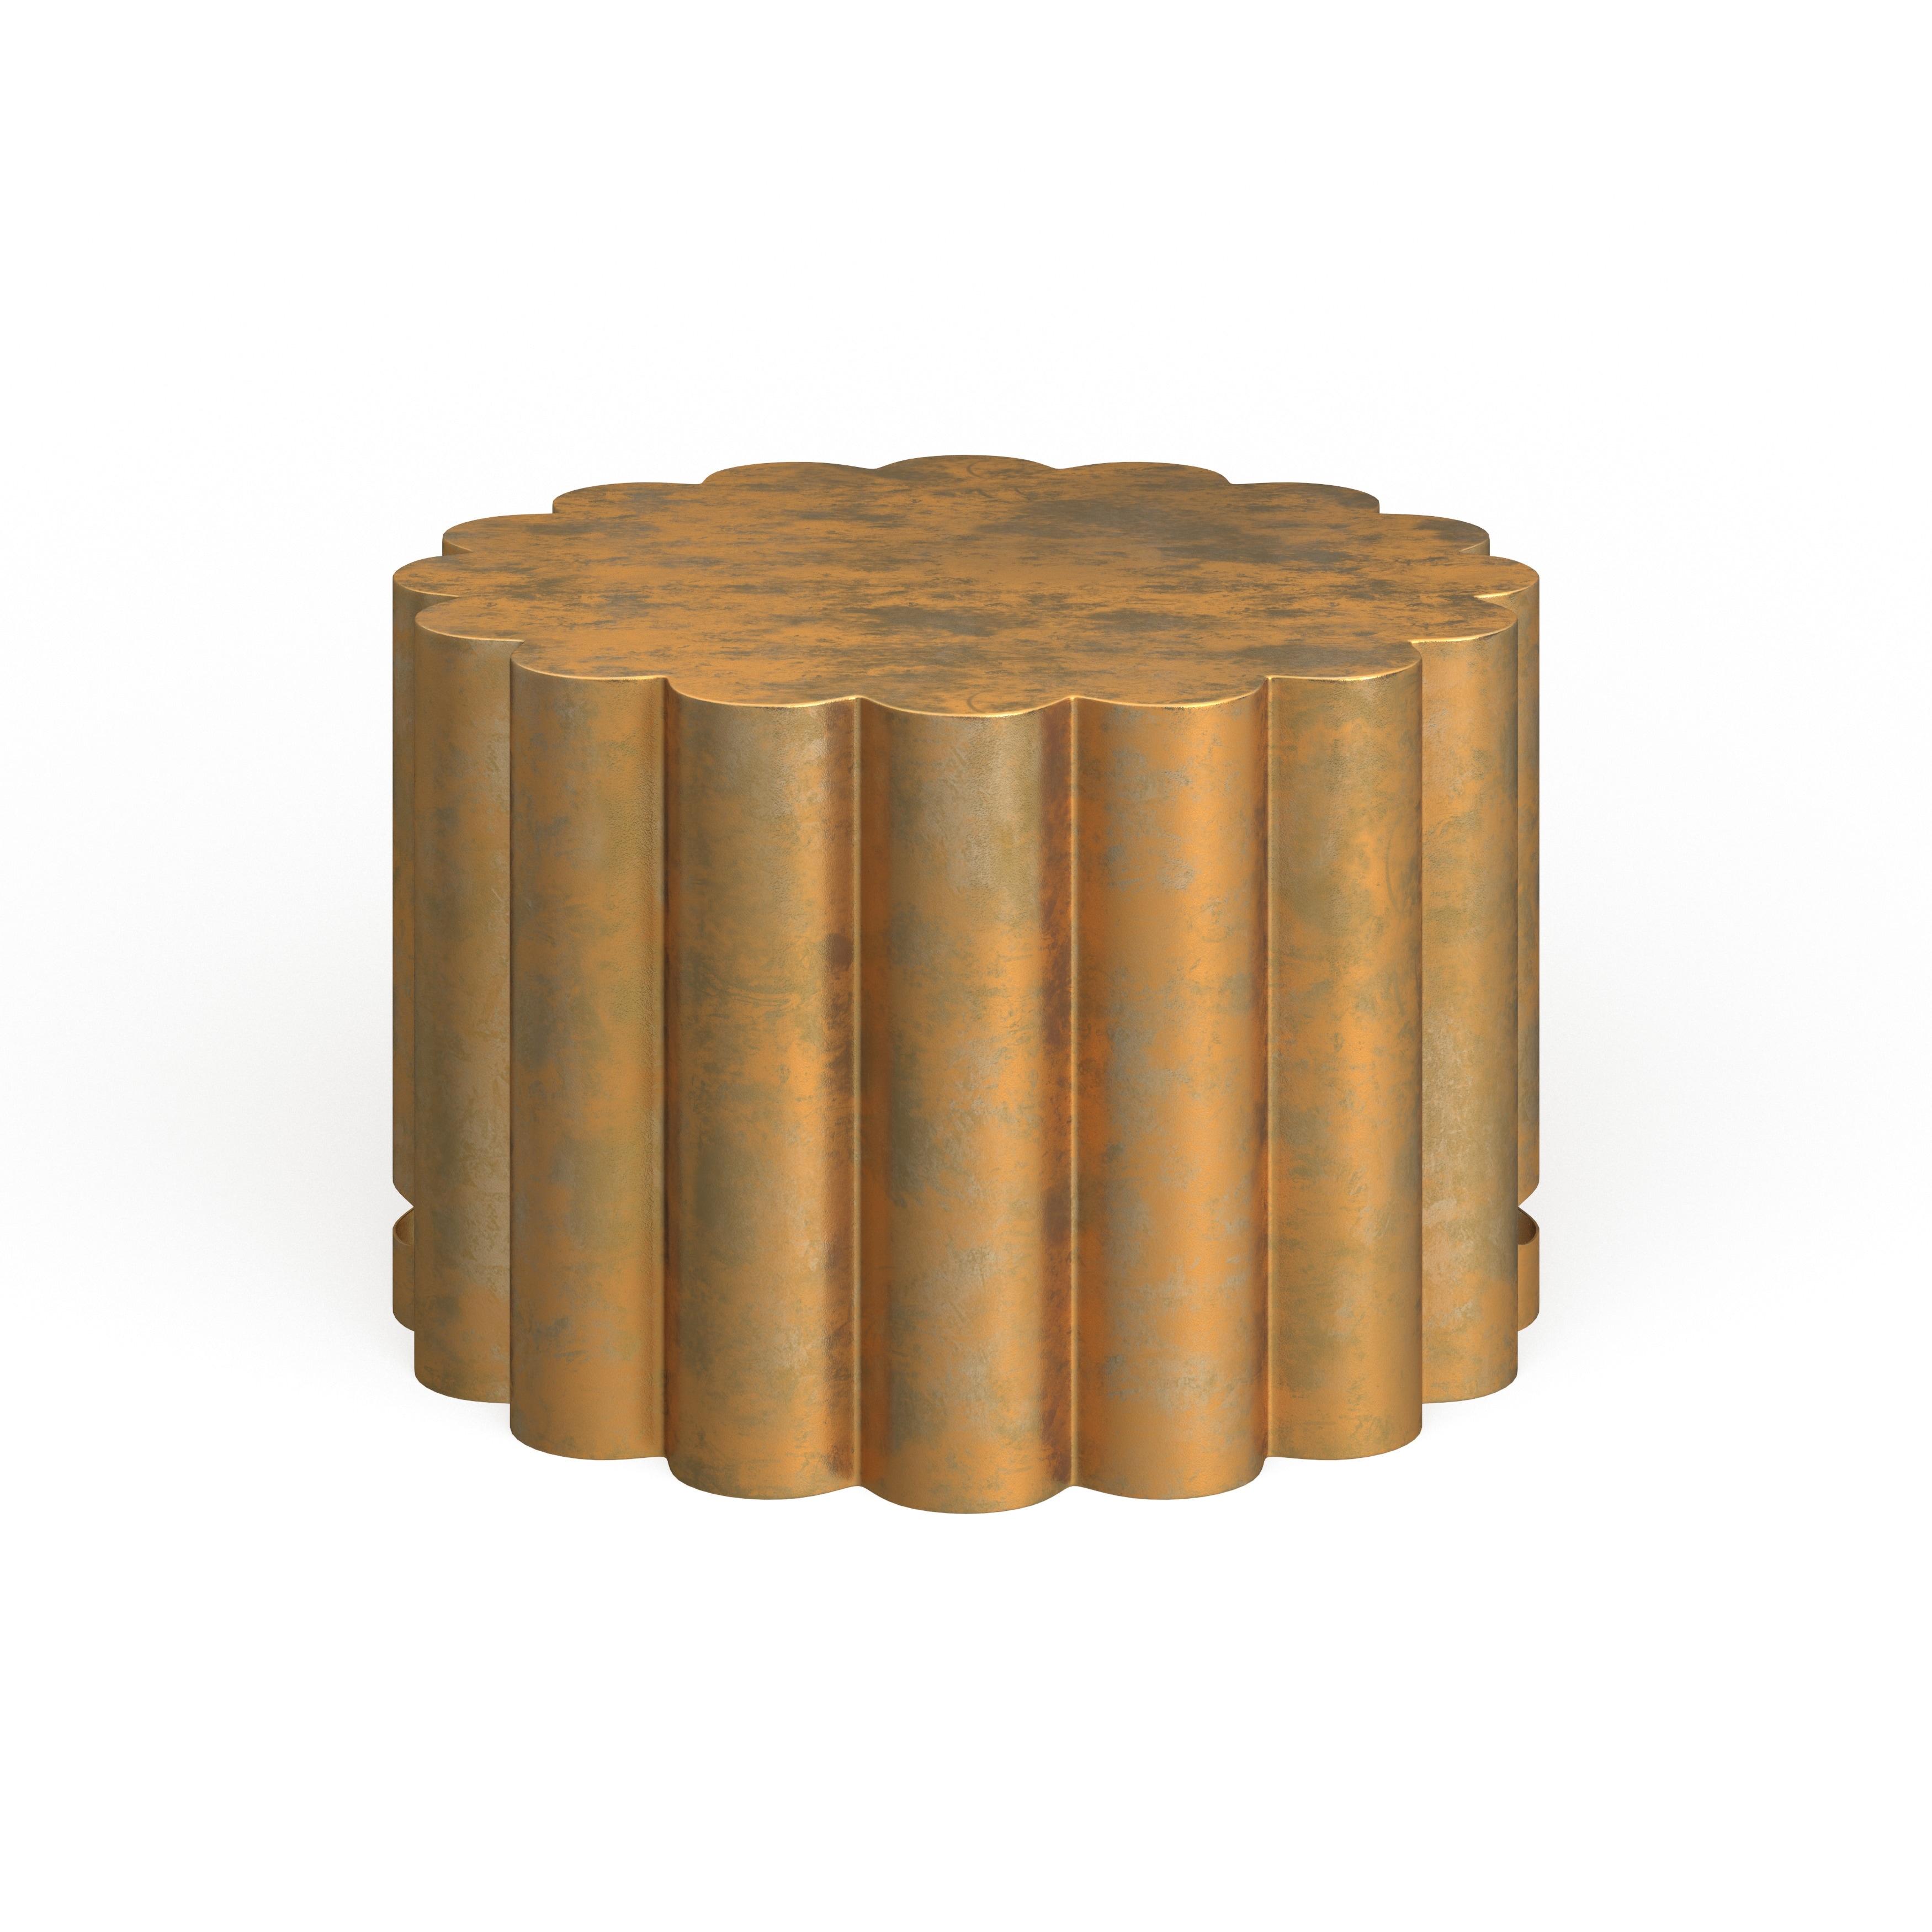 Safavieh Miriam Gold Drum Coffee Table 28 X 28 X 15 On Sale Overstock 11408266